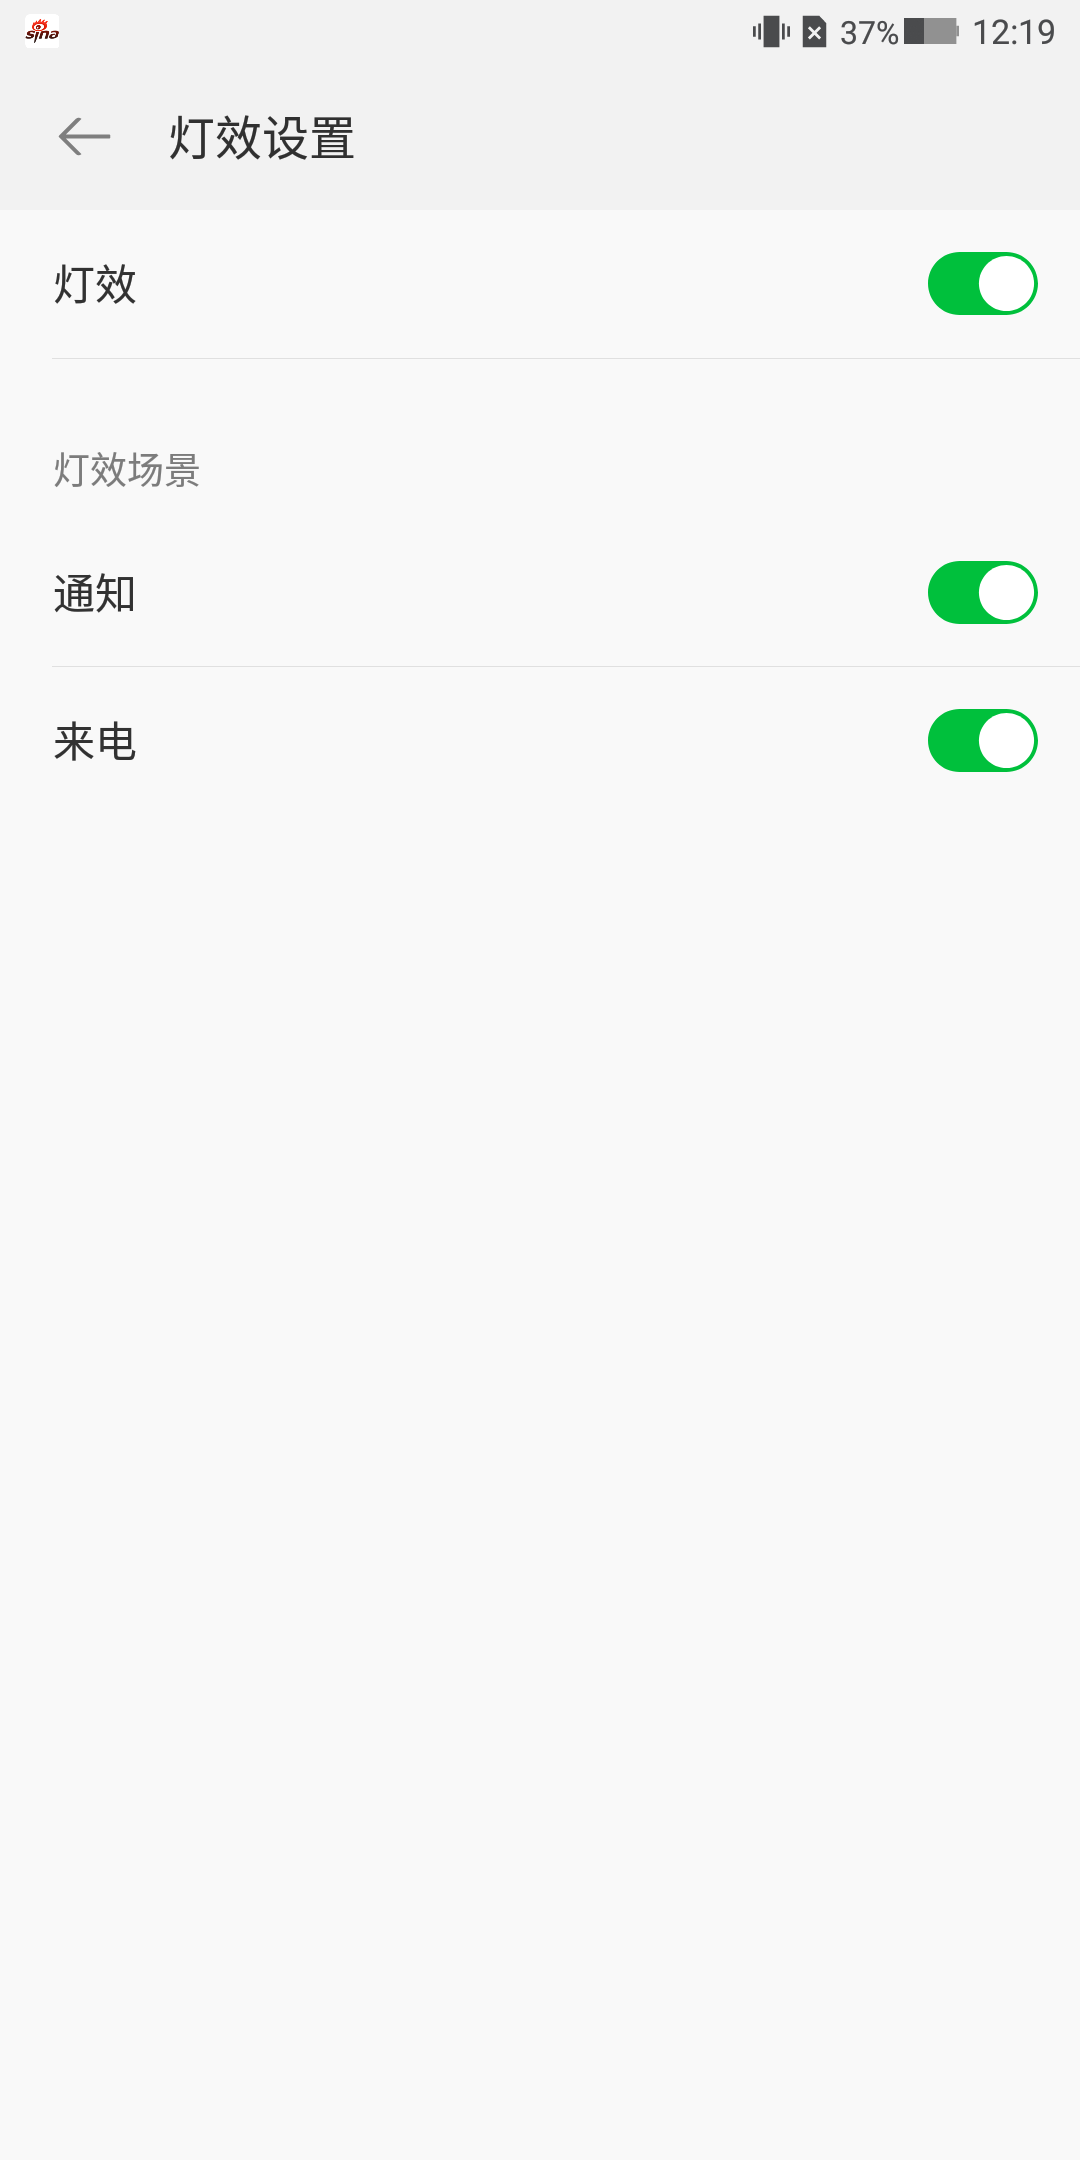 Screenshot_2018-04-27-12-19-17-469_com.android.se.png